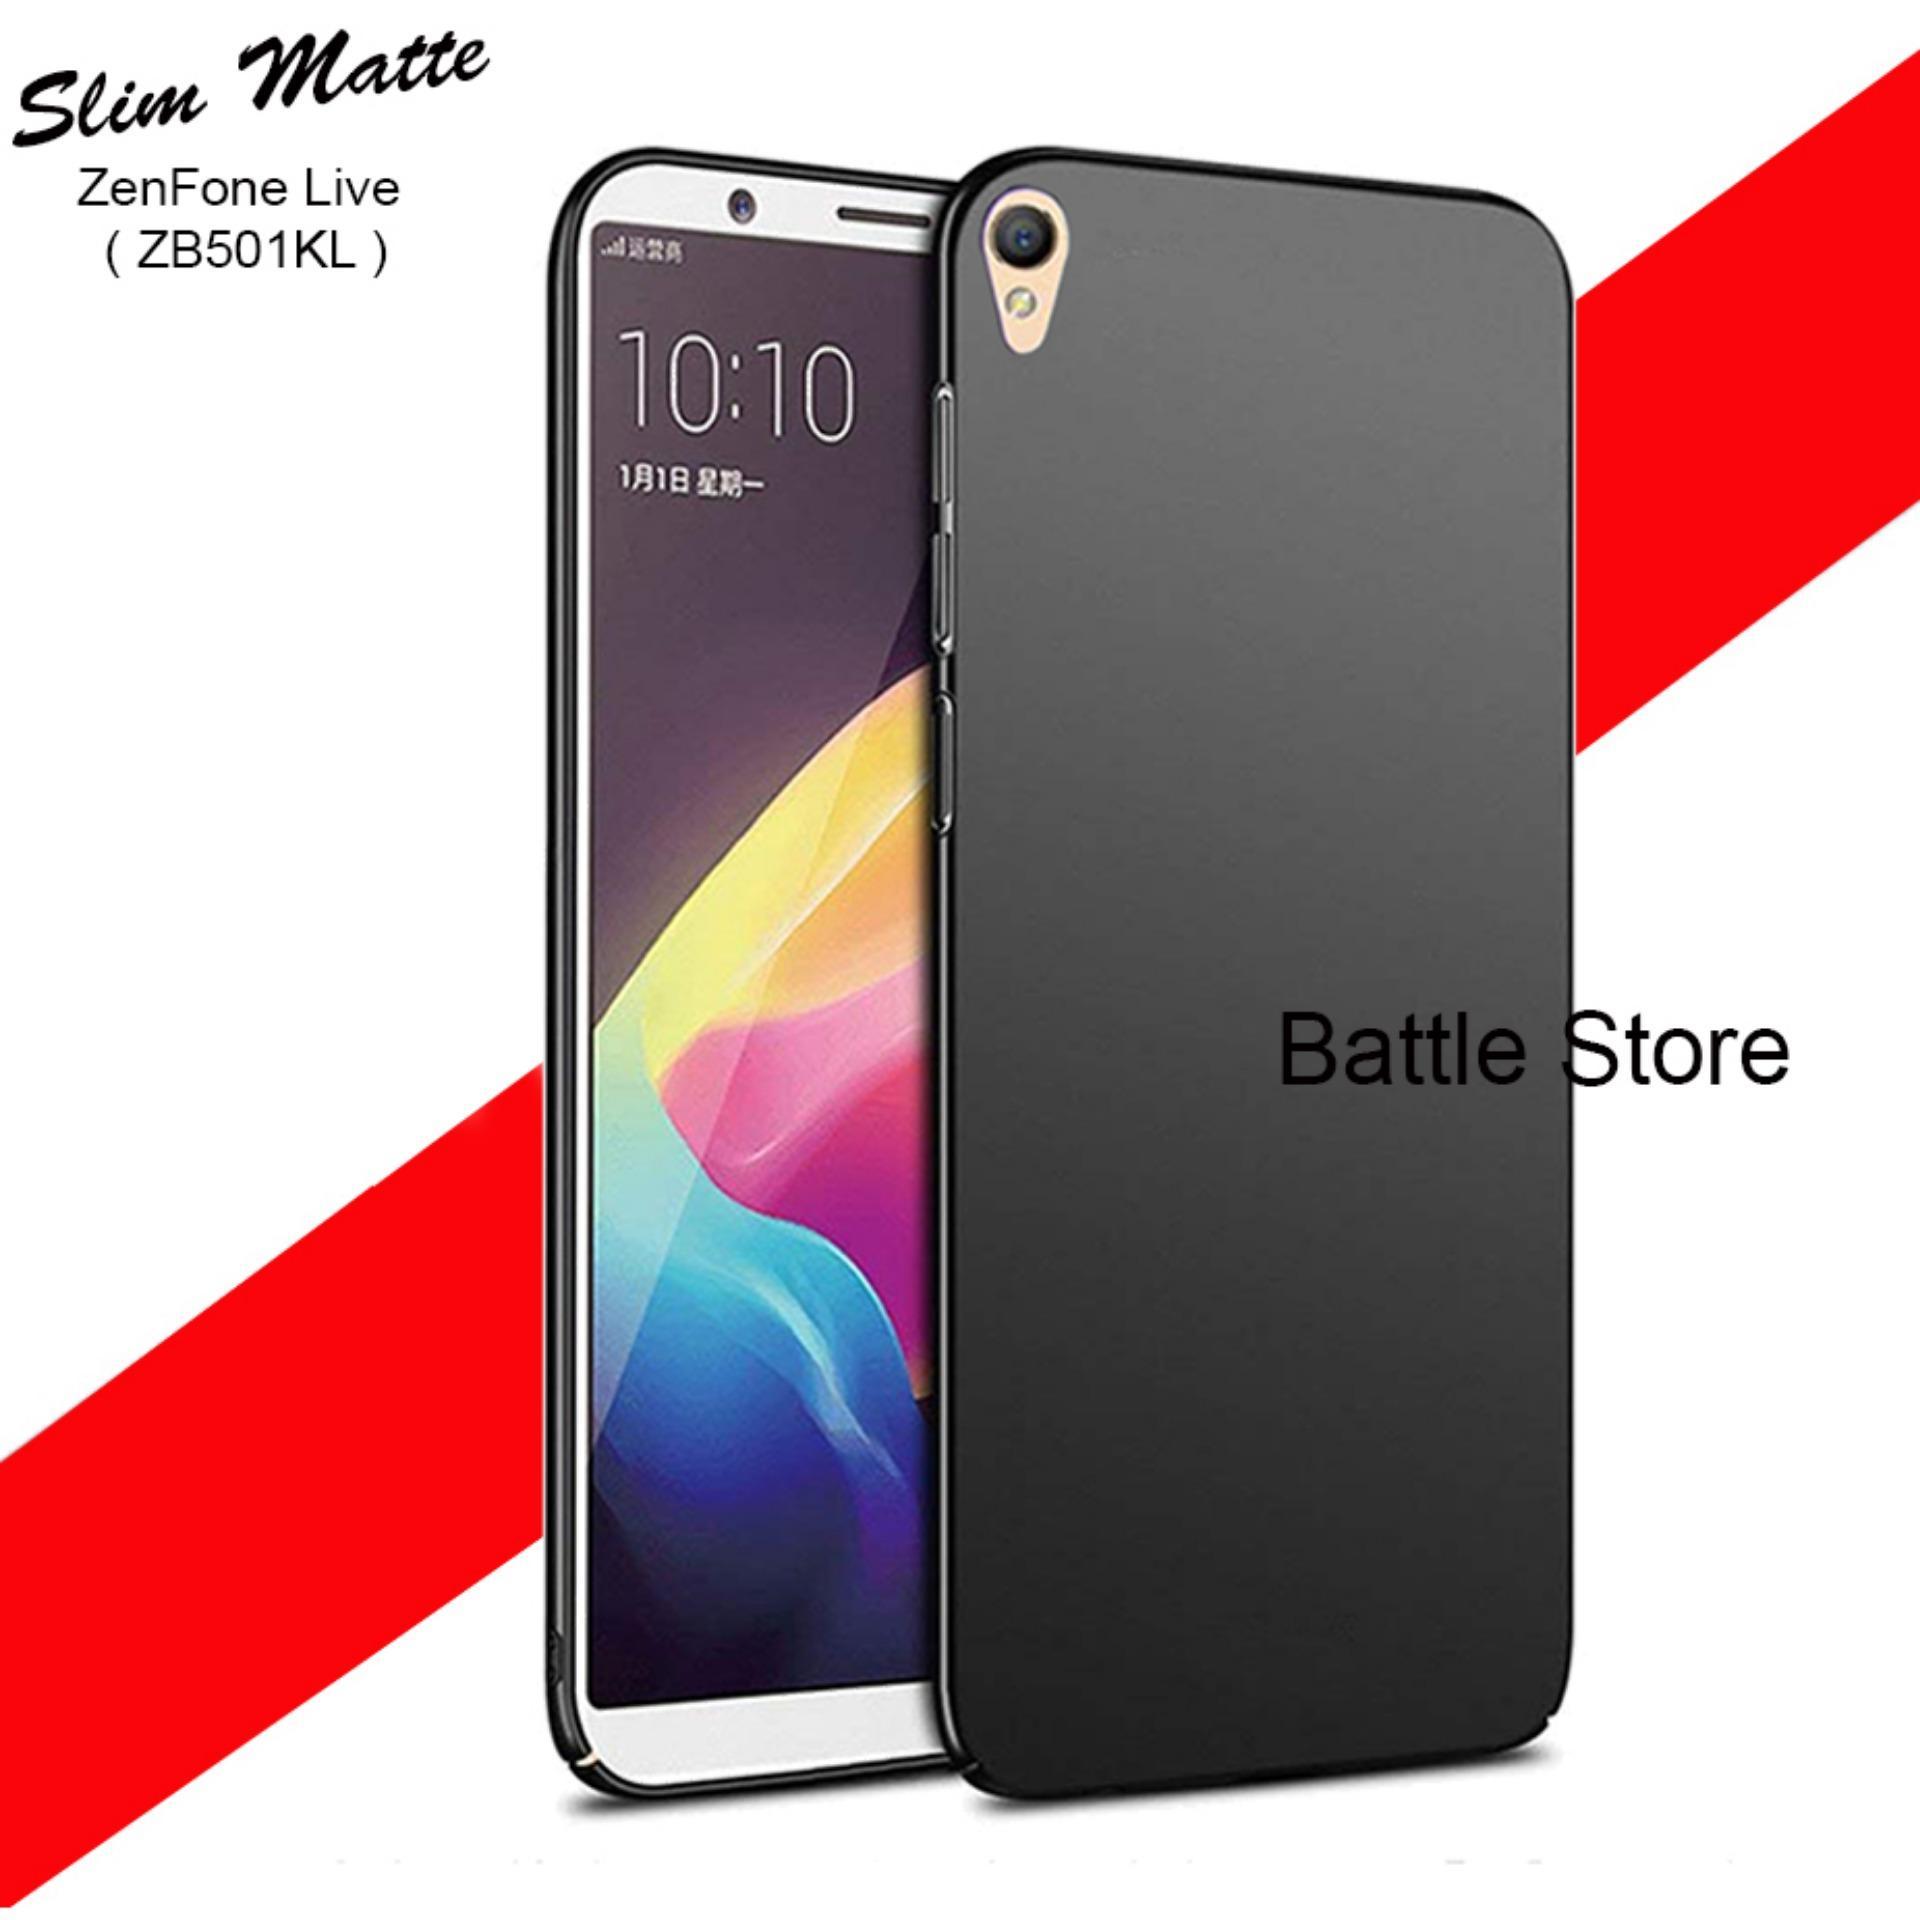 Case Slim Black Matte Asus ZenFone Live ( ZB501KL ) Baby Skin Softcase Ultra Thin Jelly Silikon Bab